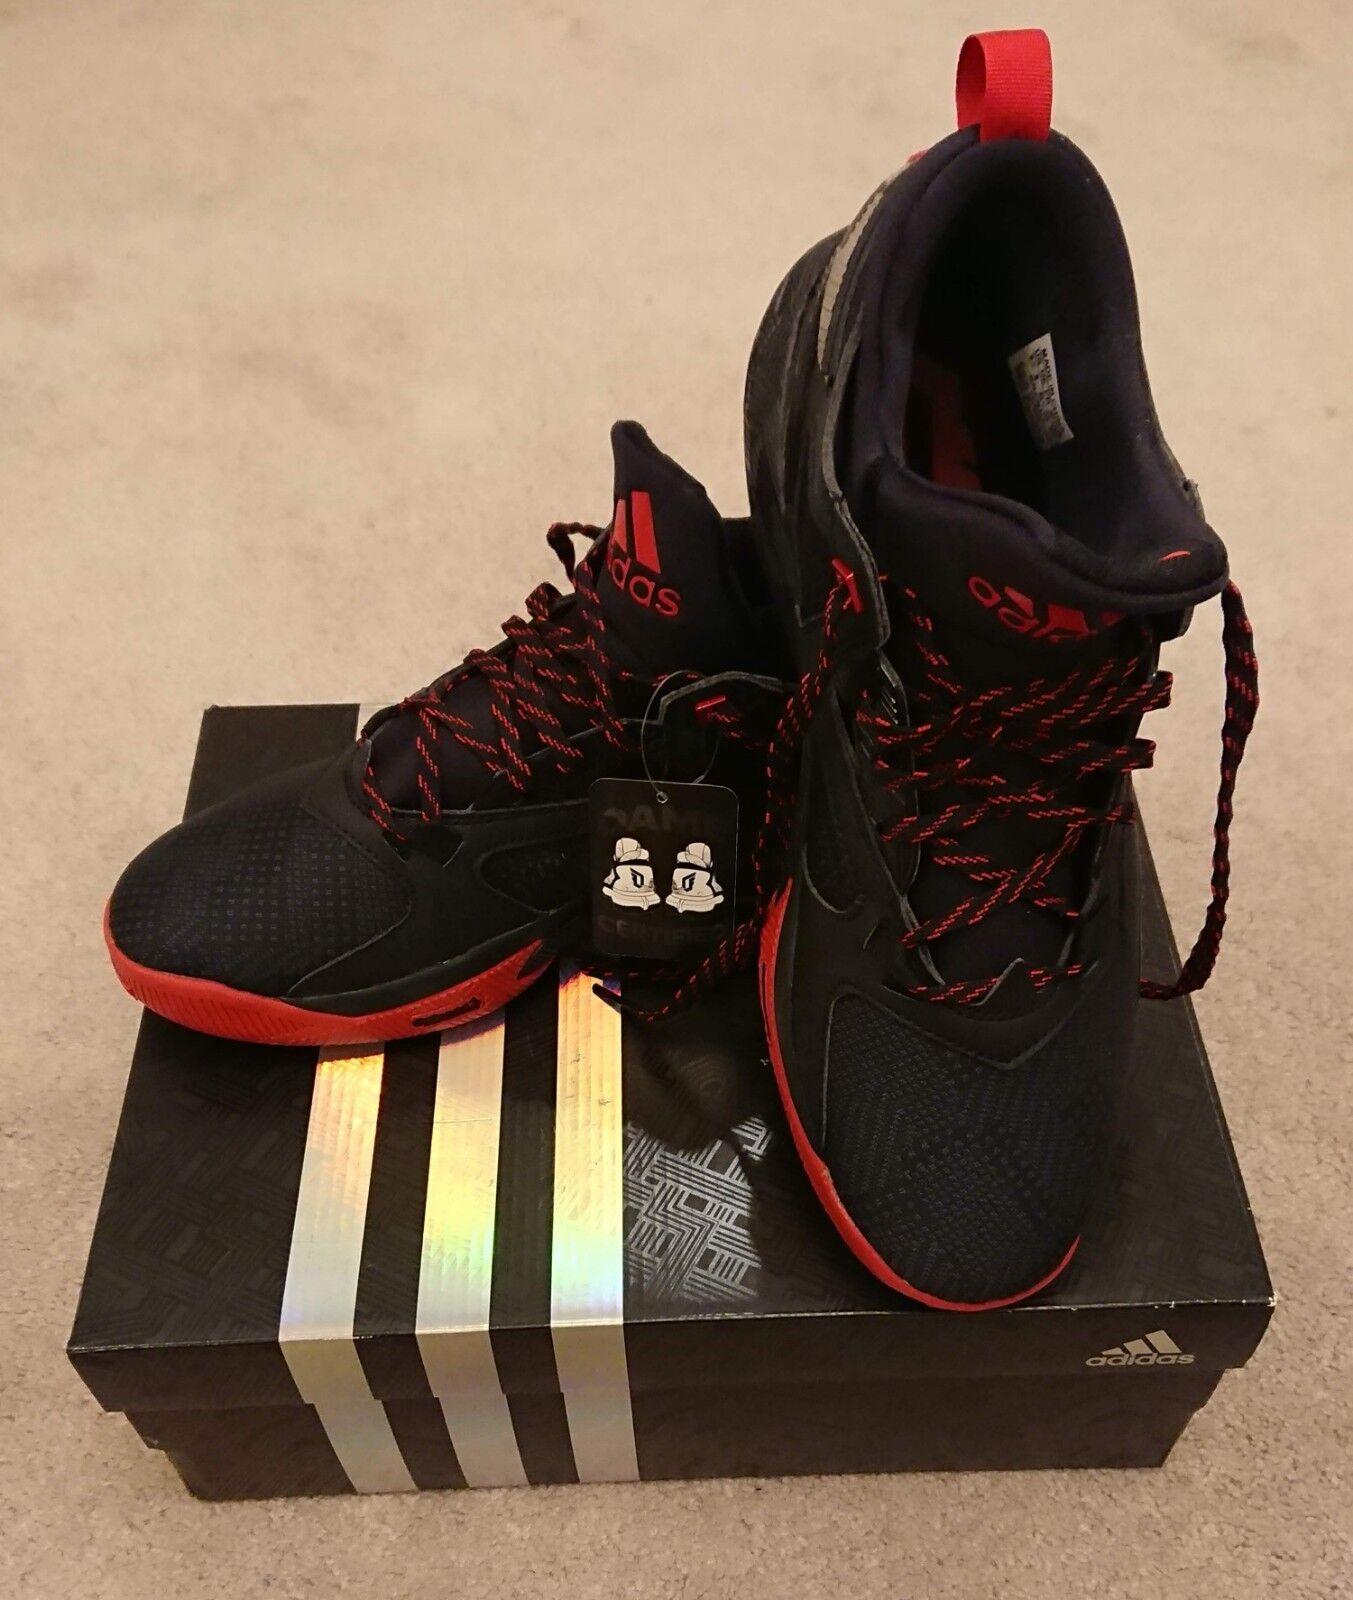 Adidas D D Adidas Lillard 2 F37124 Red Scarlet Black Dame Damian Basketball Shoe sz 9.5 84c686